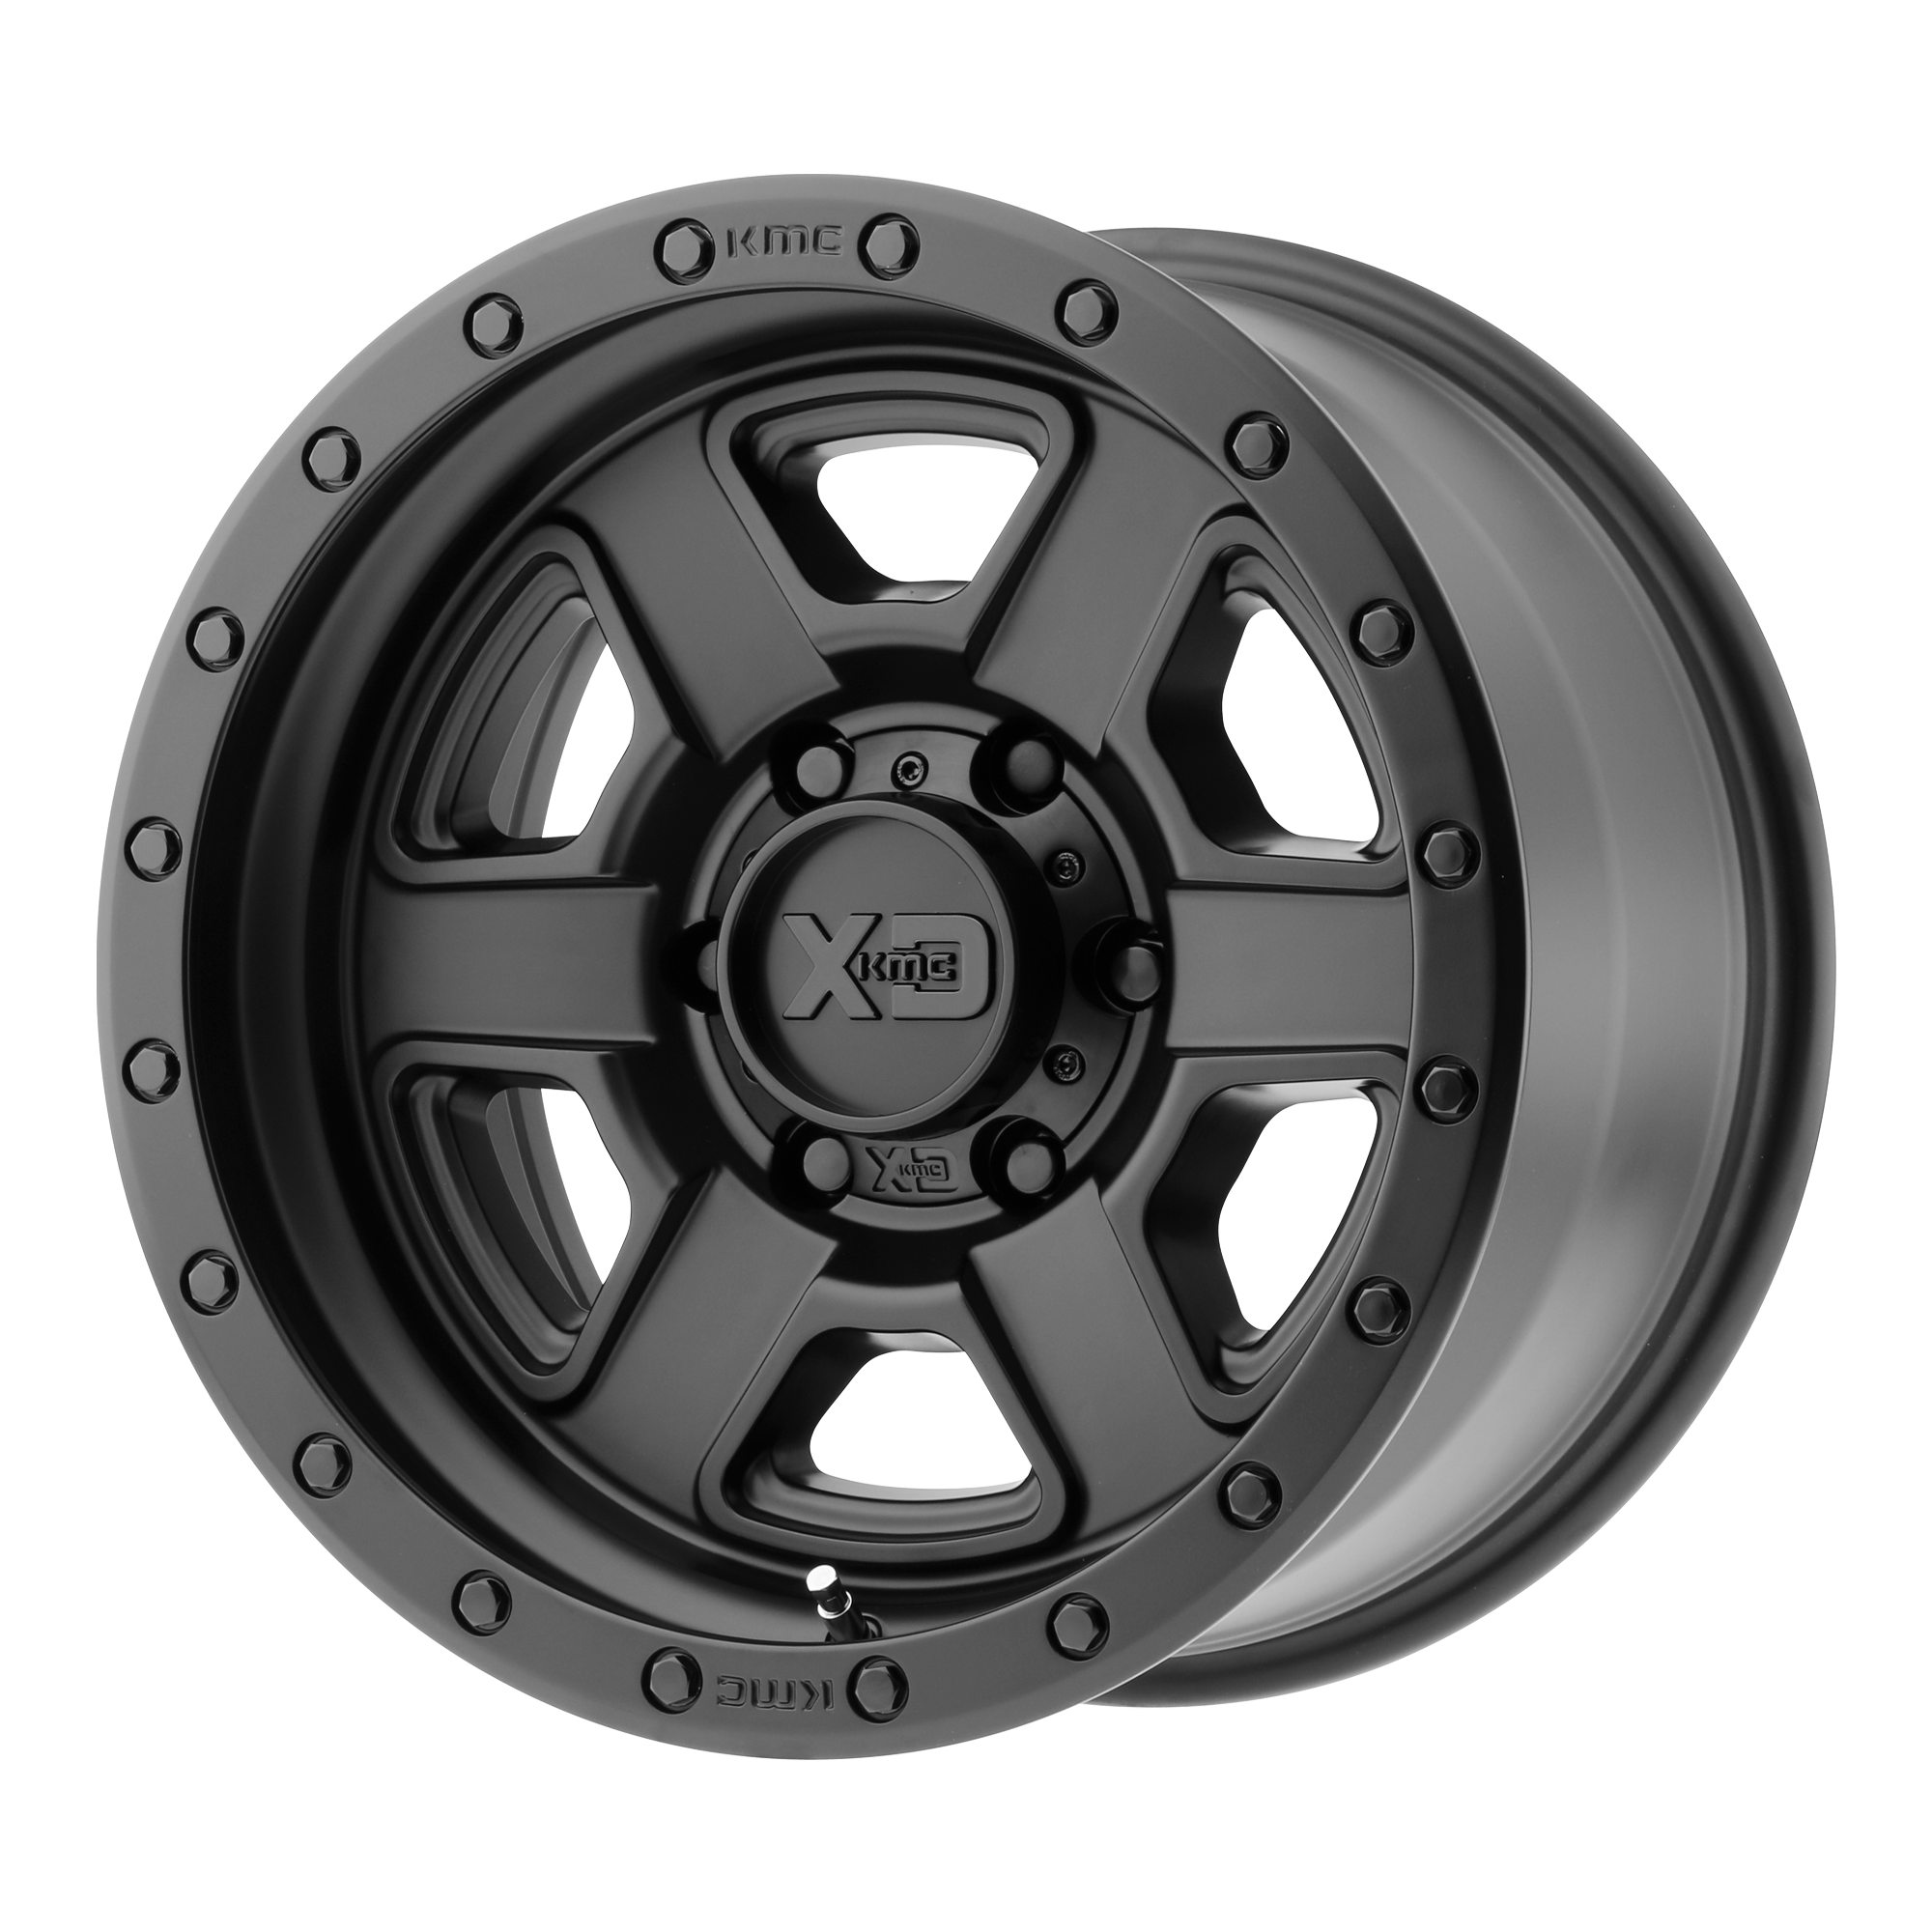 XD SERIES XD133 FUSION OFF-ROAD hliníkové disky 9x18 5x127 ET0 Satin Black